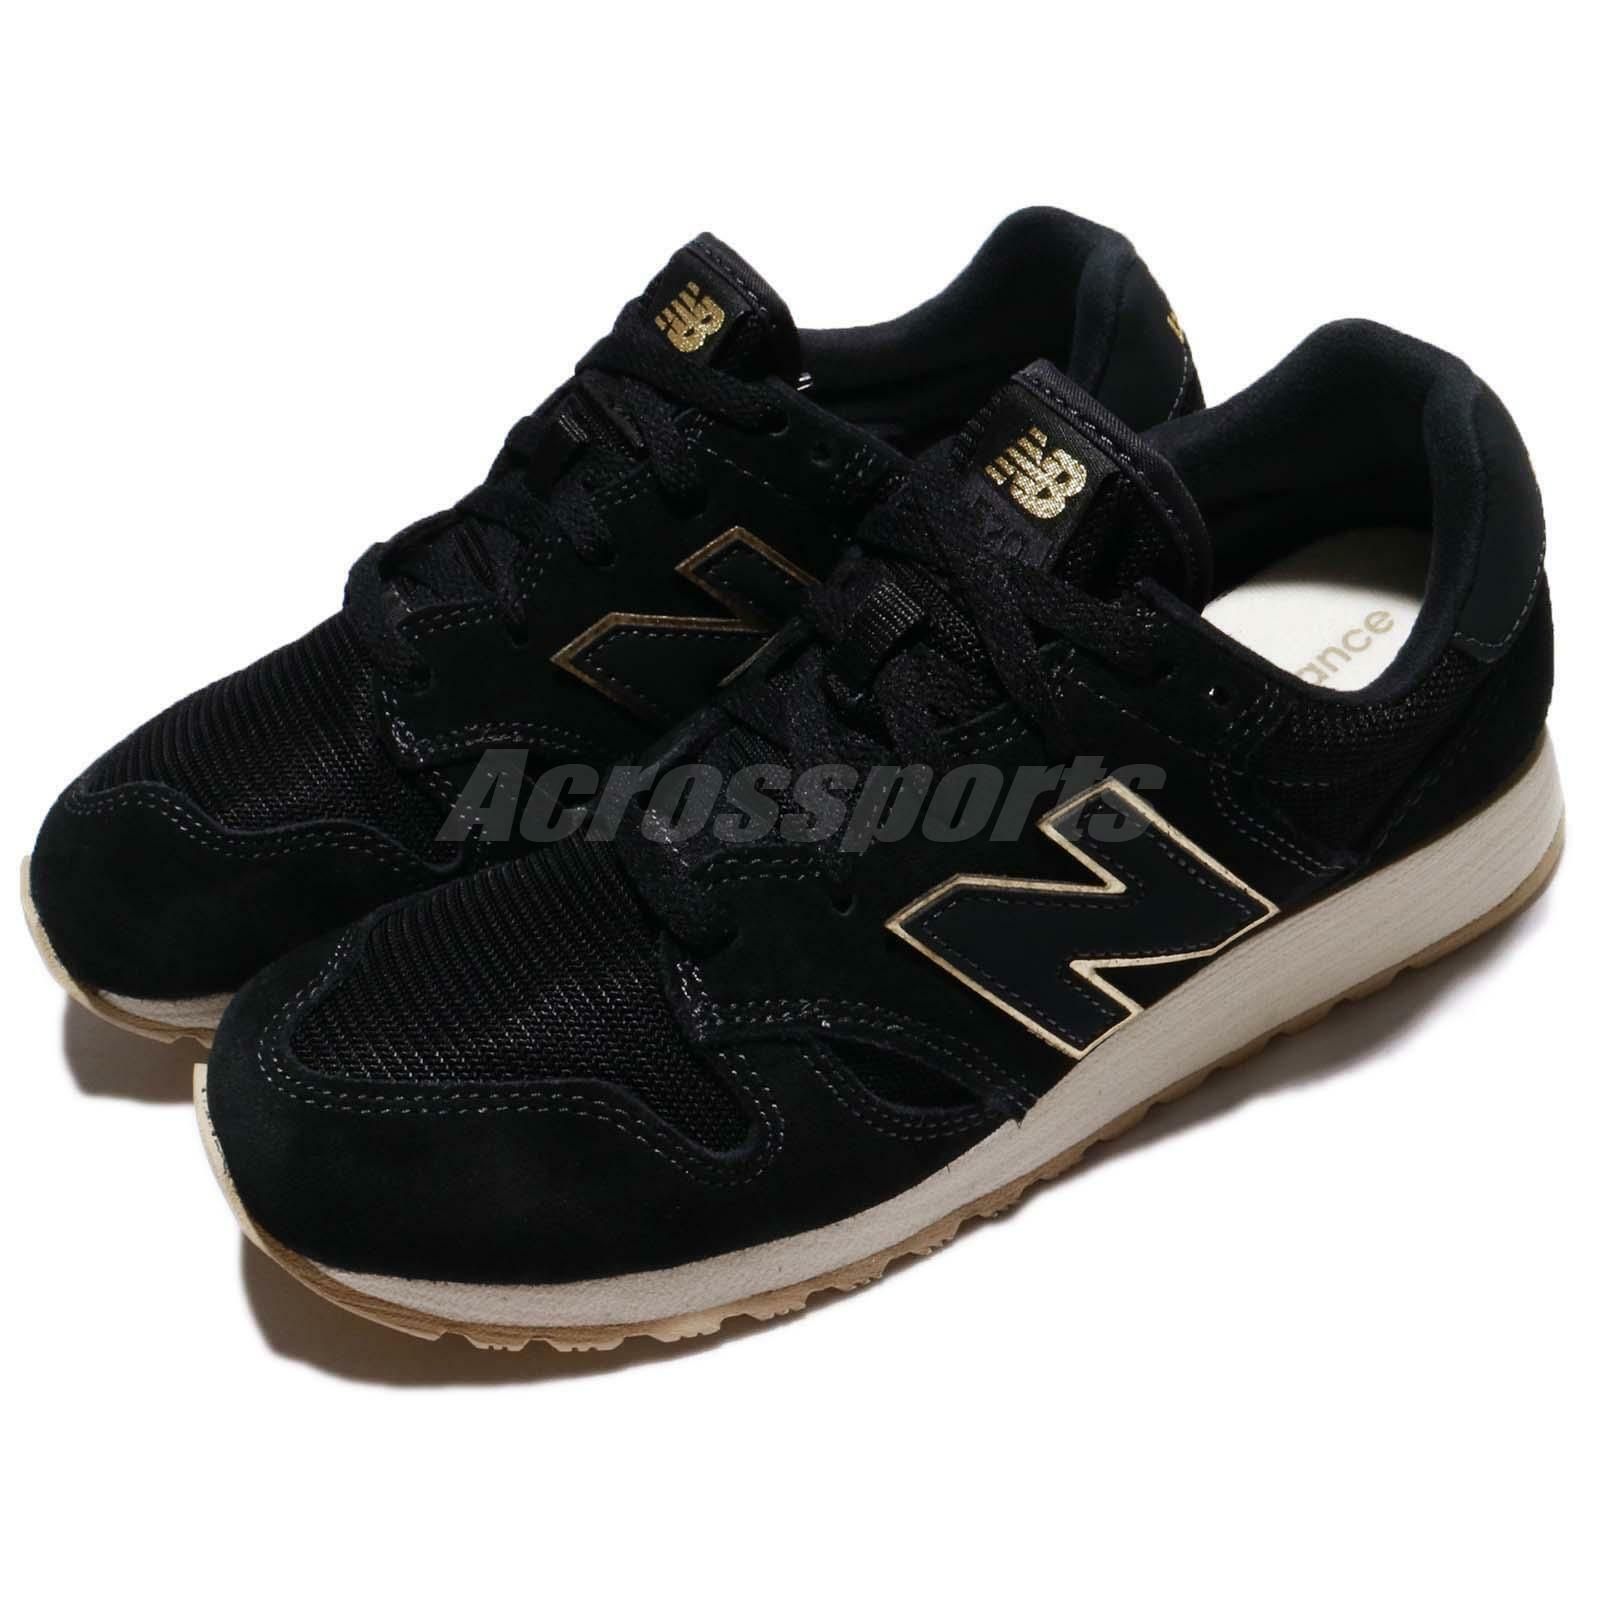 New Equilibrar WL520MR B 520 Negro Marfil Mujeres Corriendo Zapatos TENIS WL520 mrb